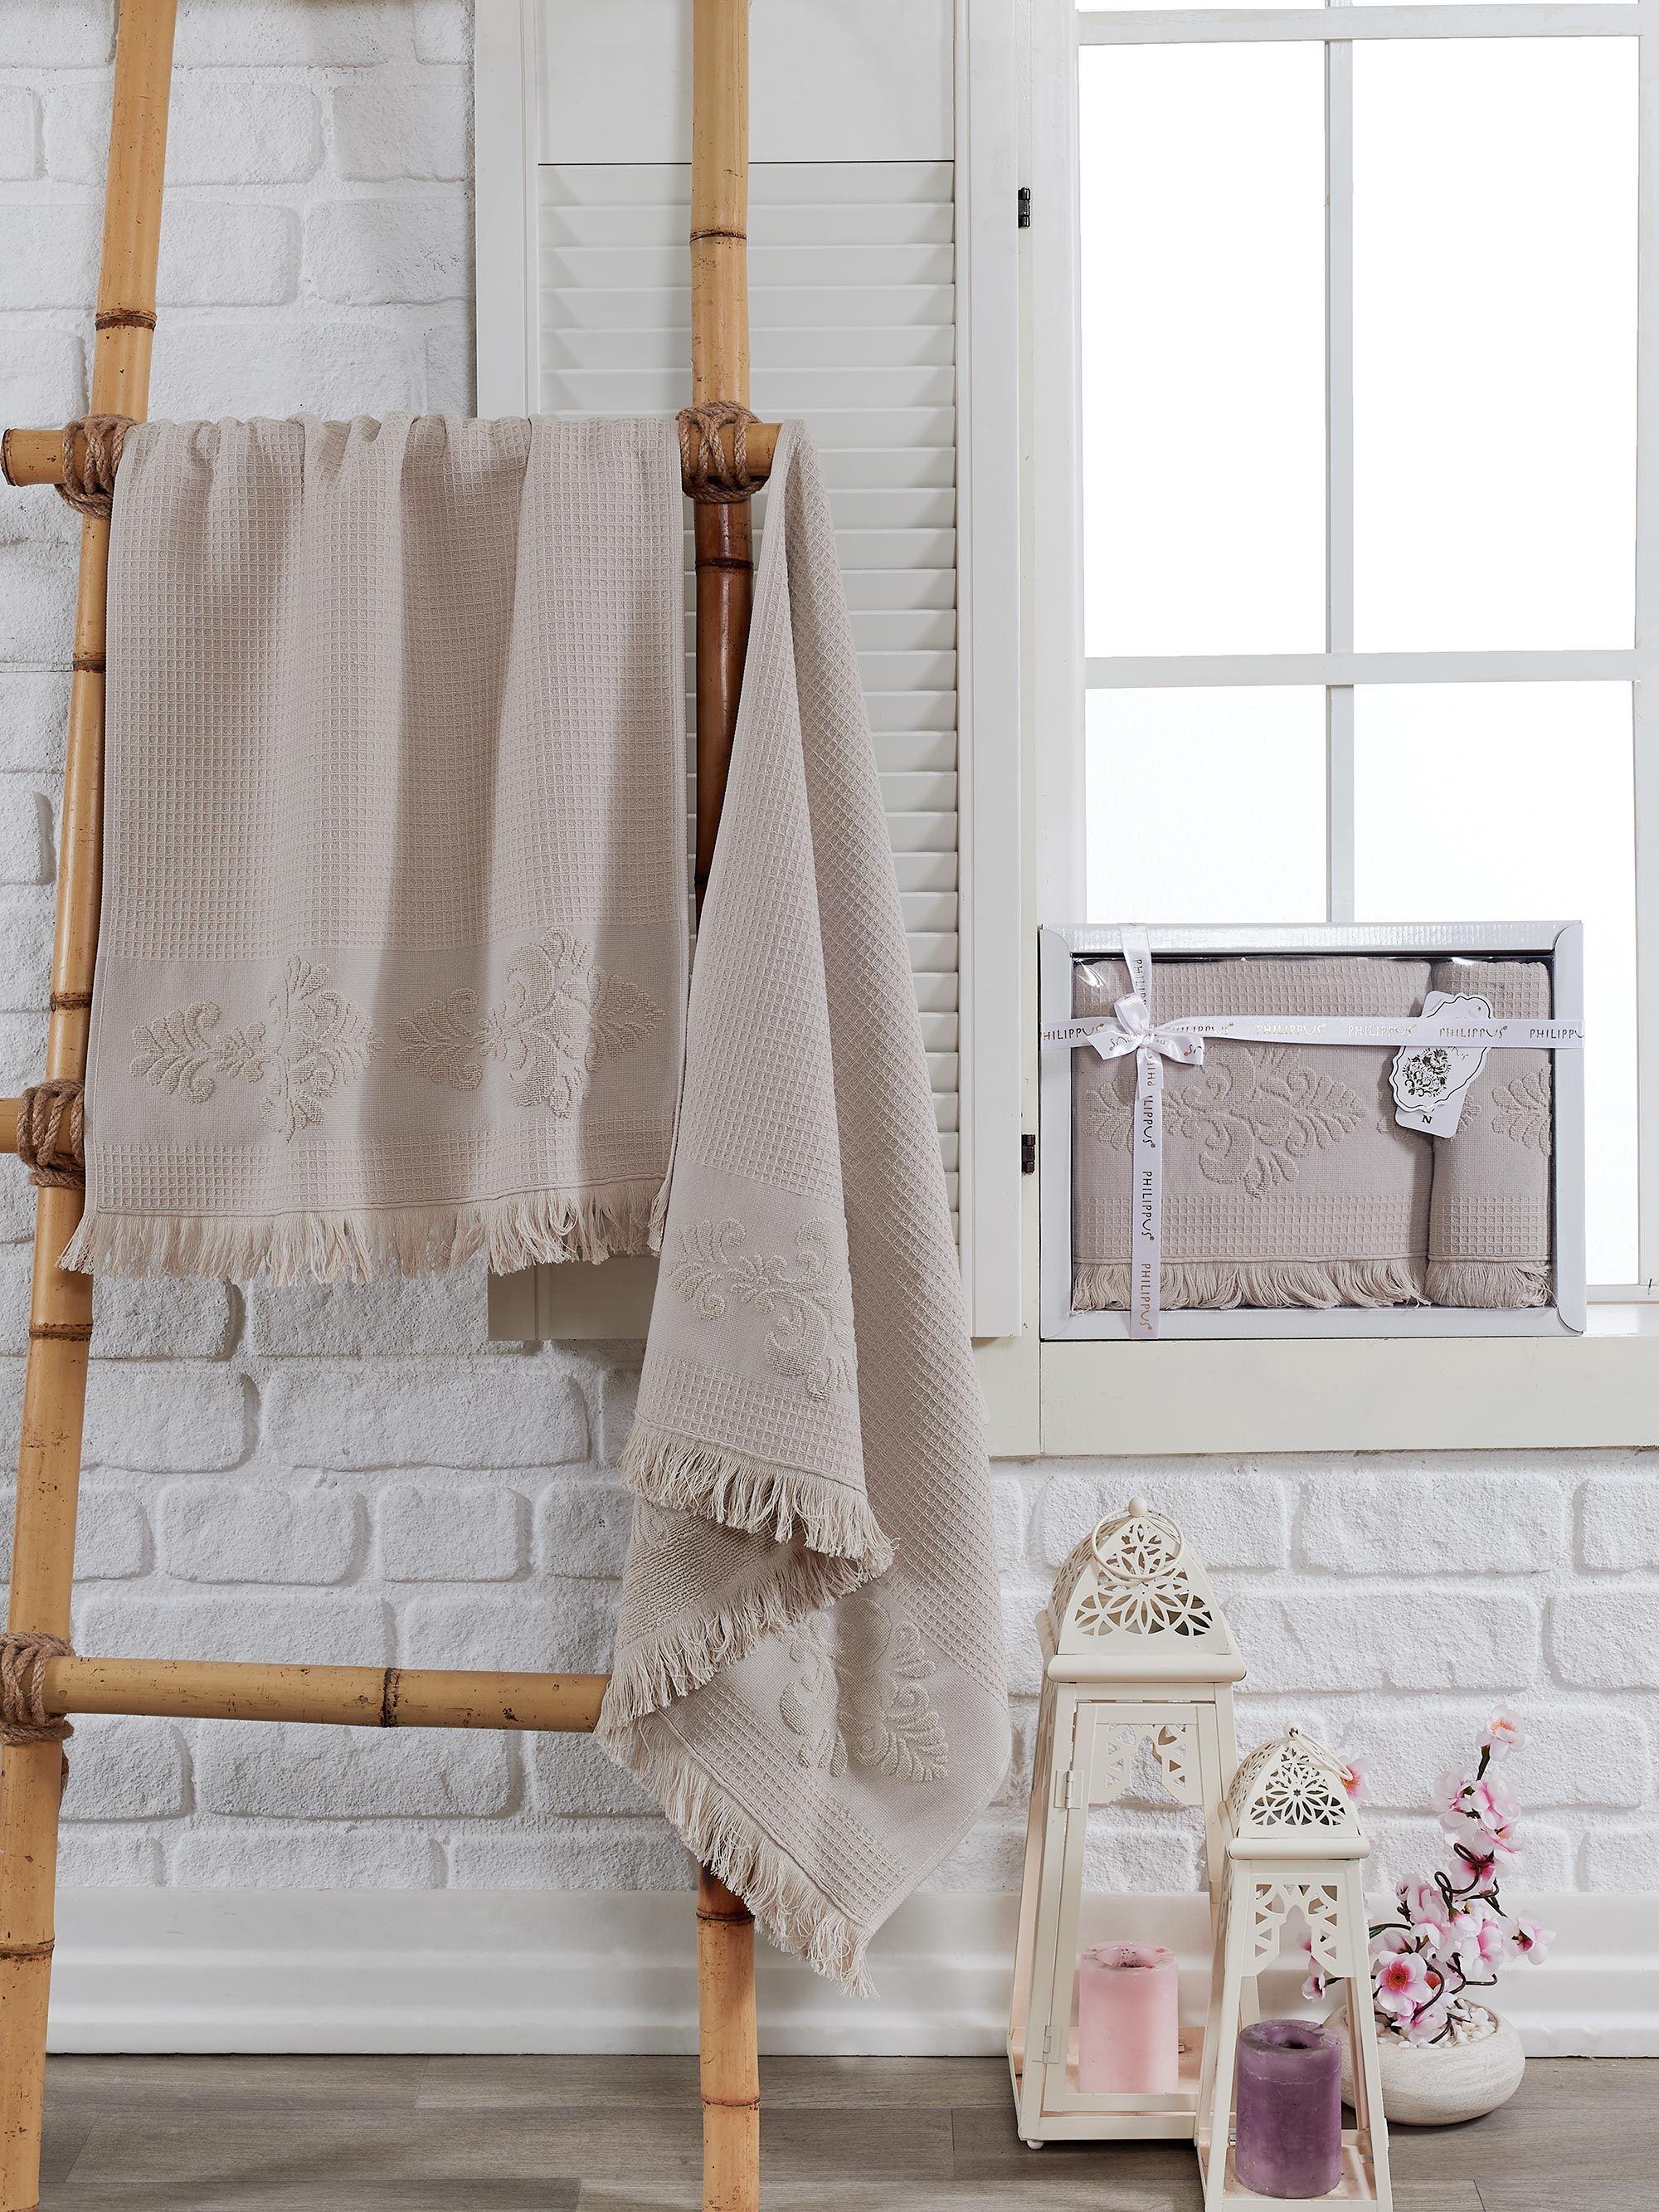 Полотенца Philippus Полотенце Ahus Цвет: Бежевый (50х90 см,70х140 см) полотенца philippus полотенце maura цвет кремовый 50х90 см